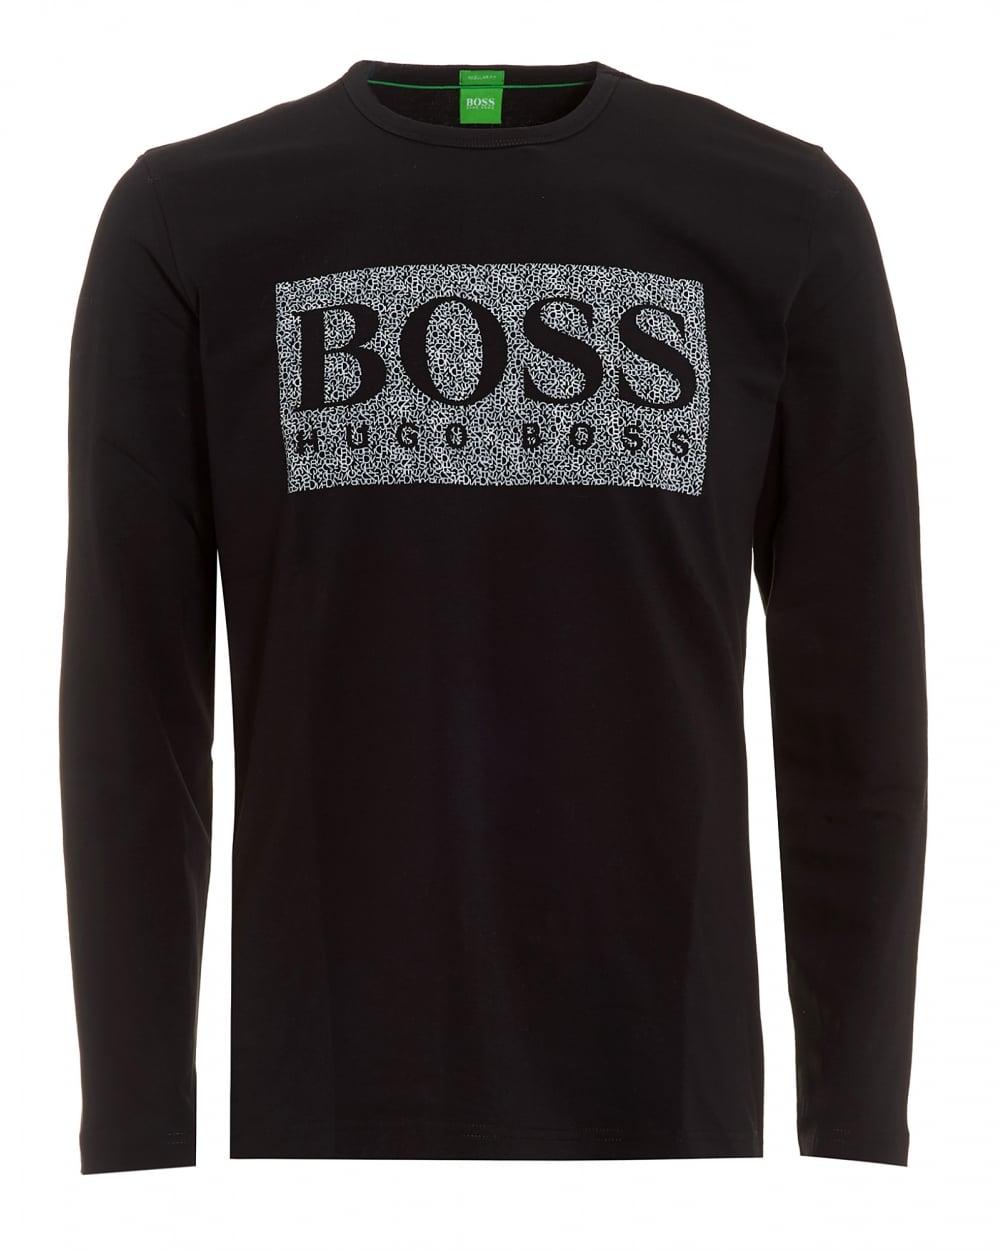 0f4ffa5c6 Hugo Boss Green Mens Togn 1 T-Shirt, Black Long Sleeve Logo Tee